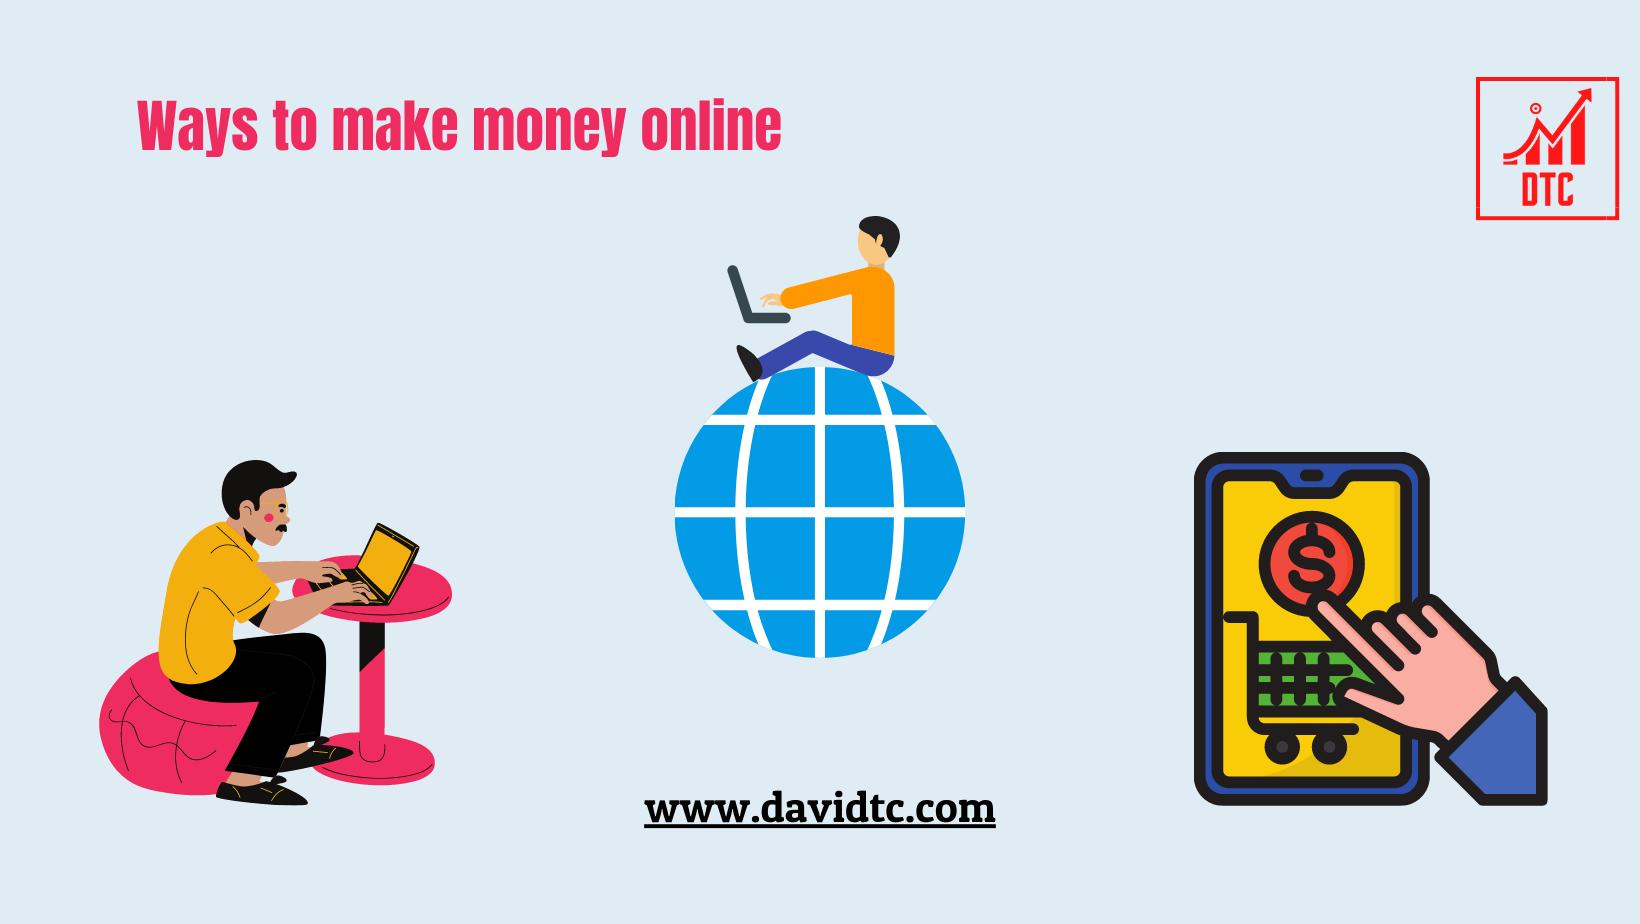 Simple ways to make money online